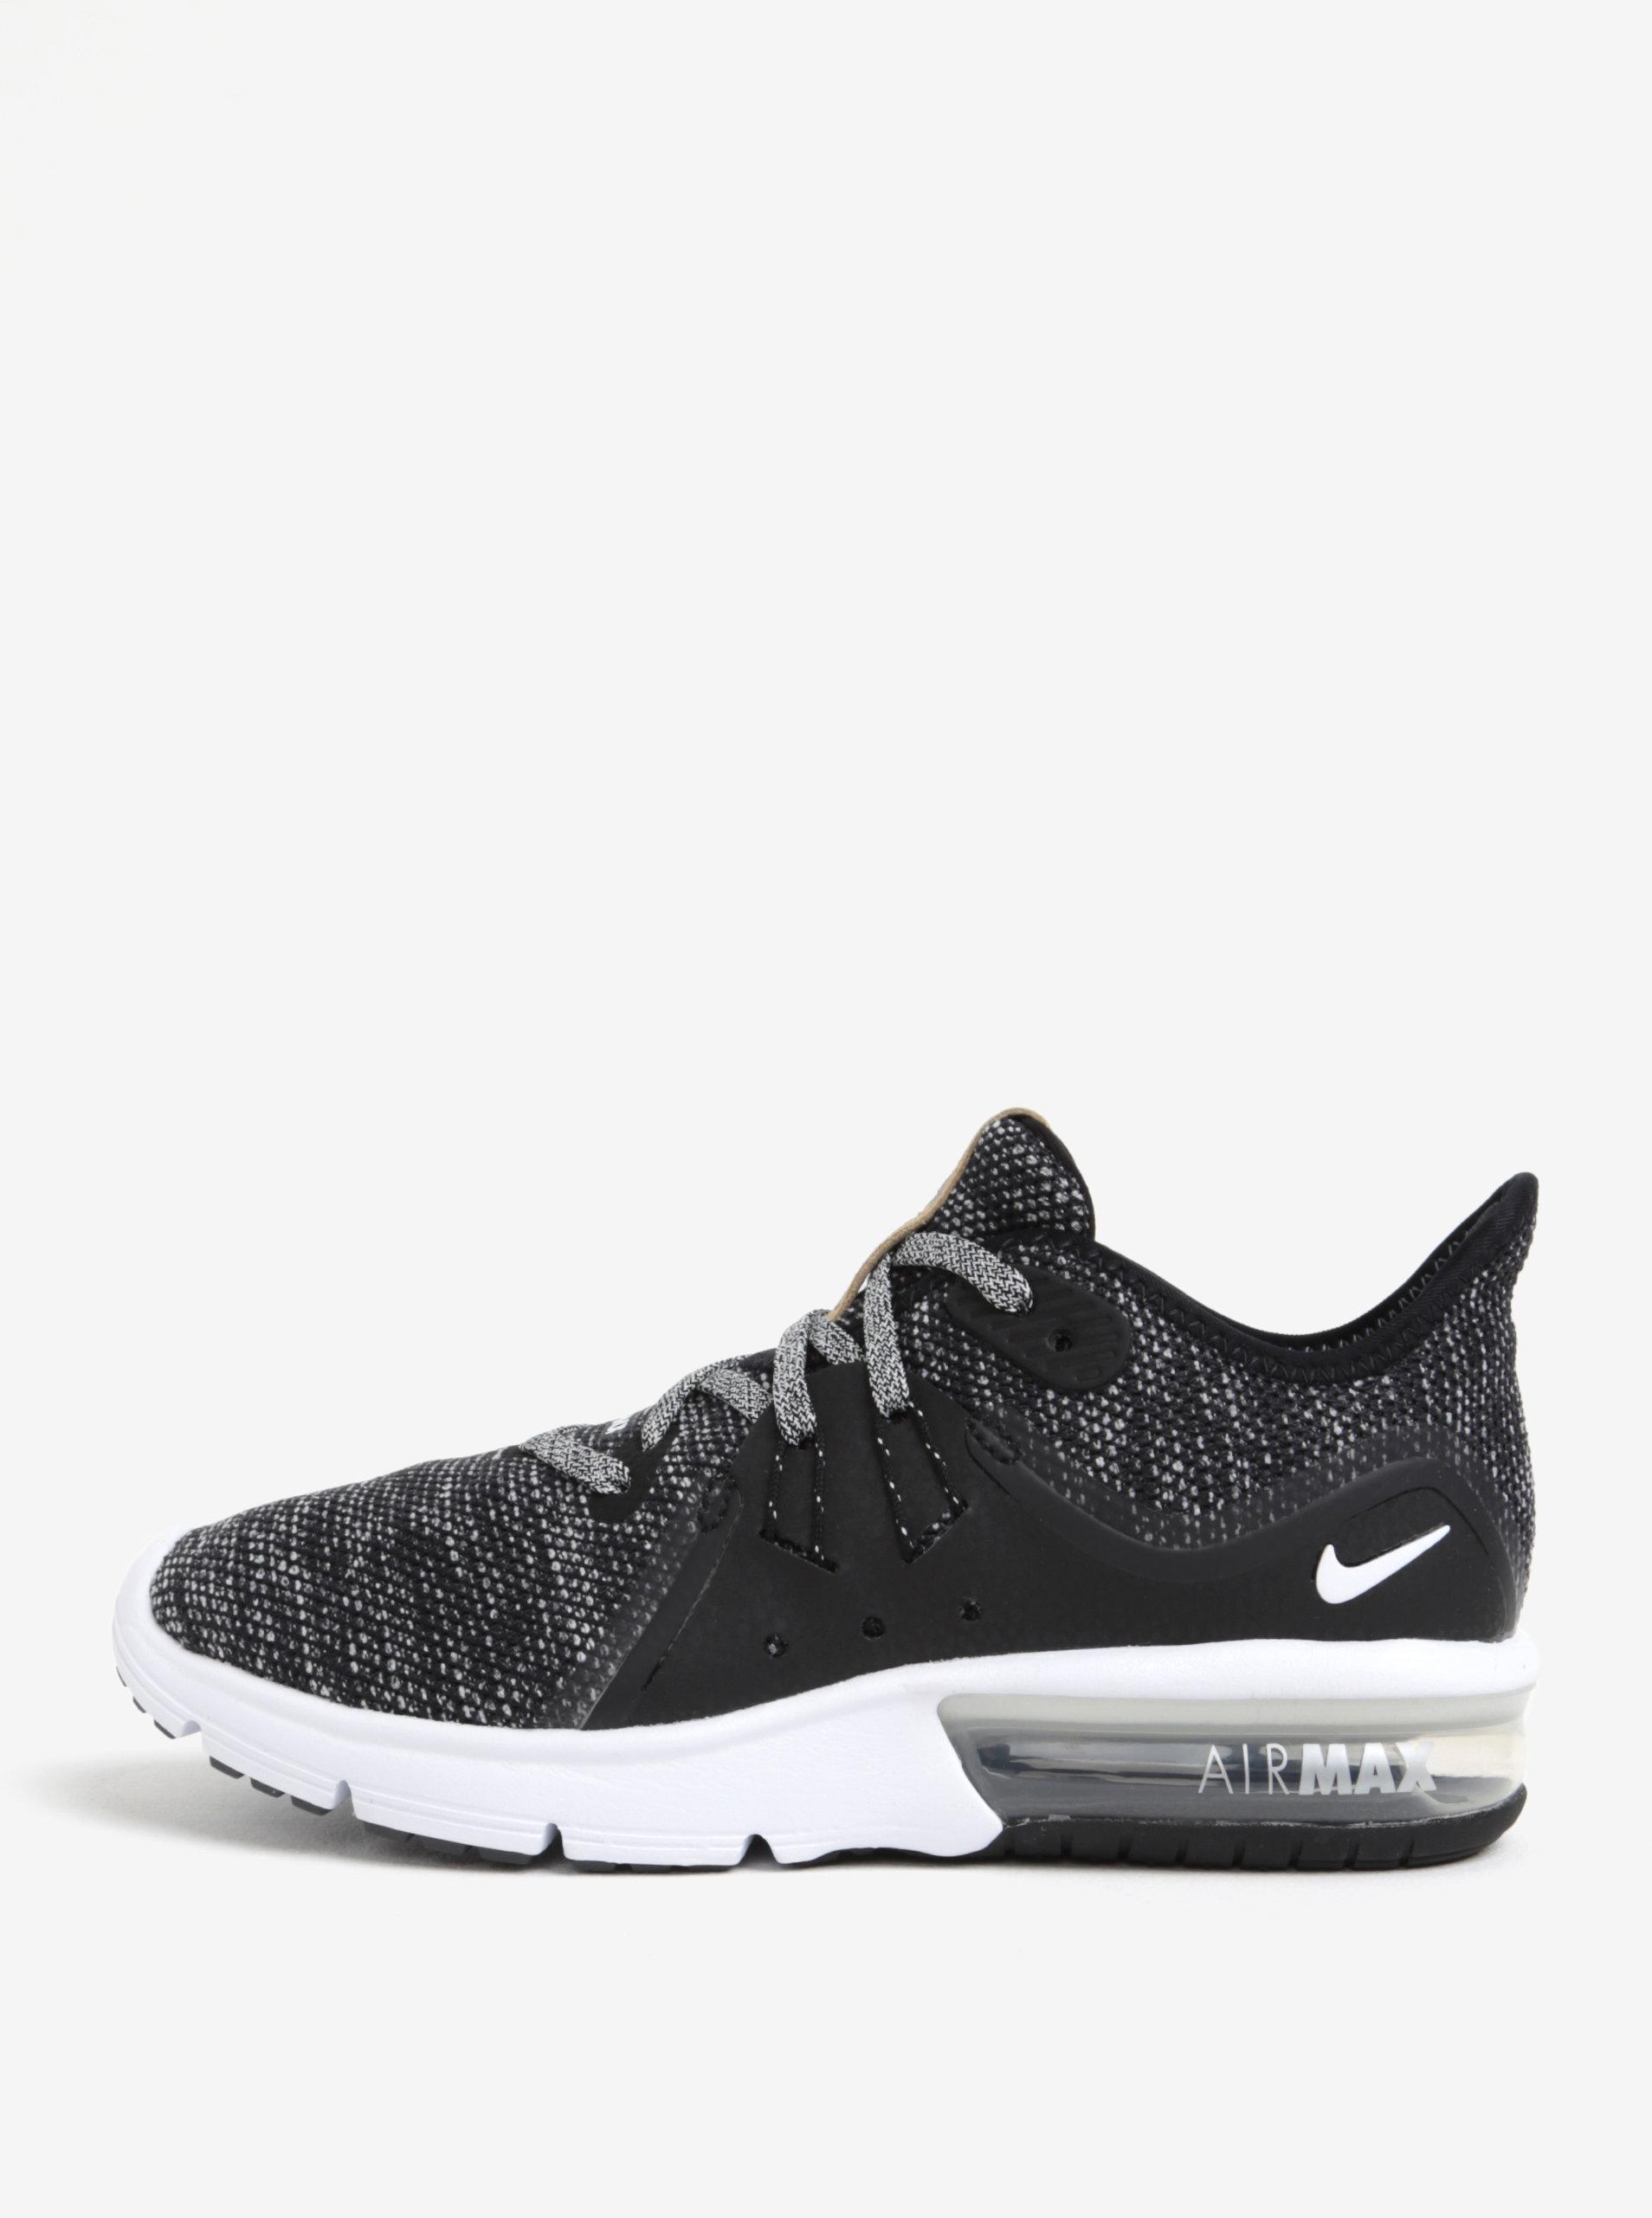 Černé dámské žíhané tenisky Nike Air Max Sequent 3 Running ... 233fed4dd3